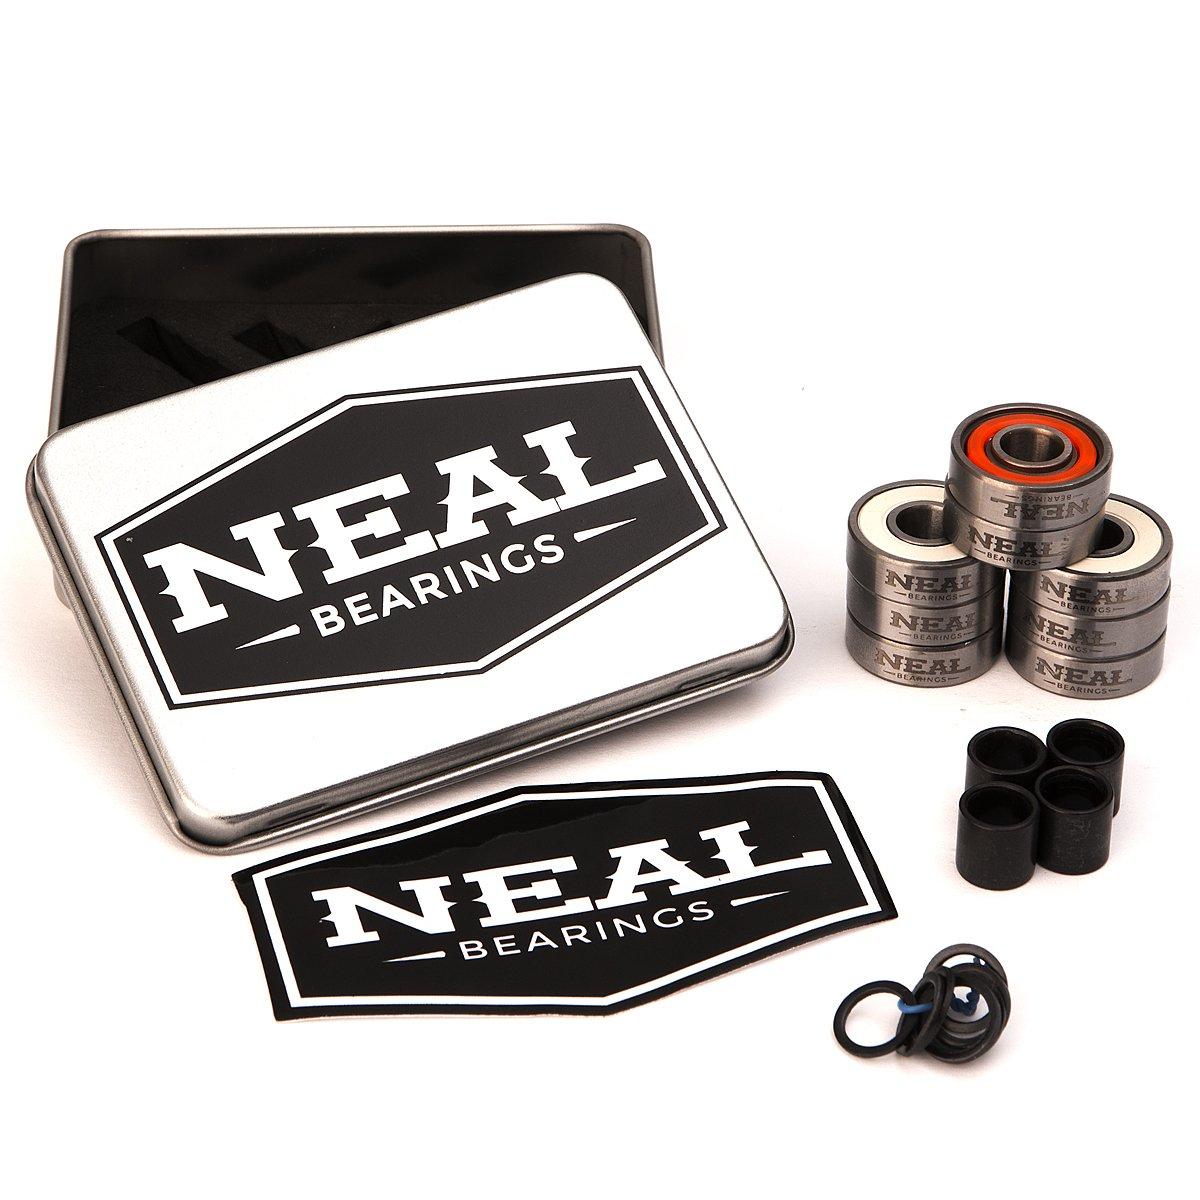 Neal Precision Hurricane Skate Bearings 608rs - Skateboard - Longboard - Inline - Scooter. The Best Bearings Guaranteed. (Orange/Swiss, 8 Pcs)